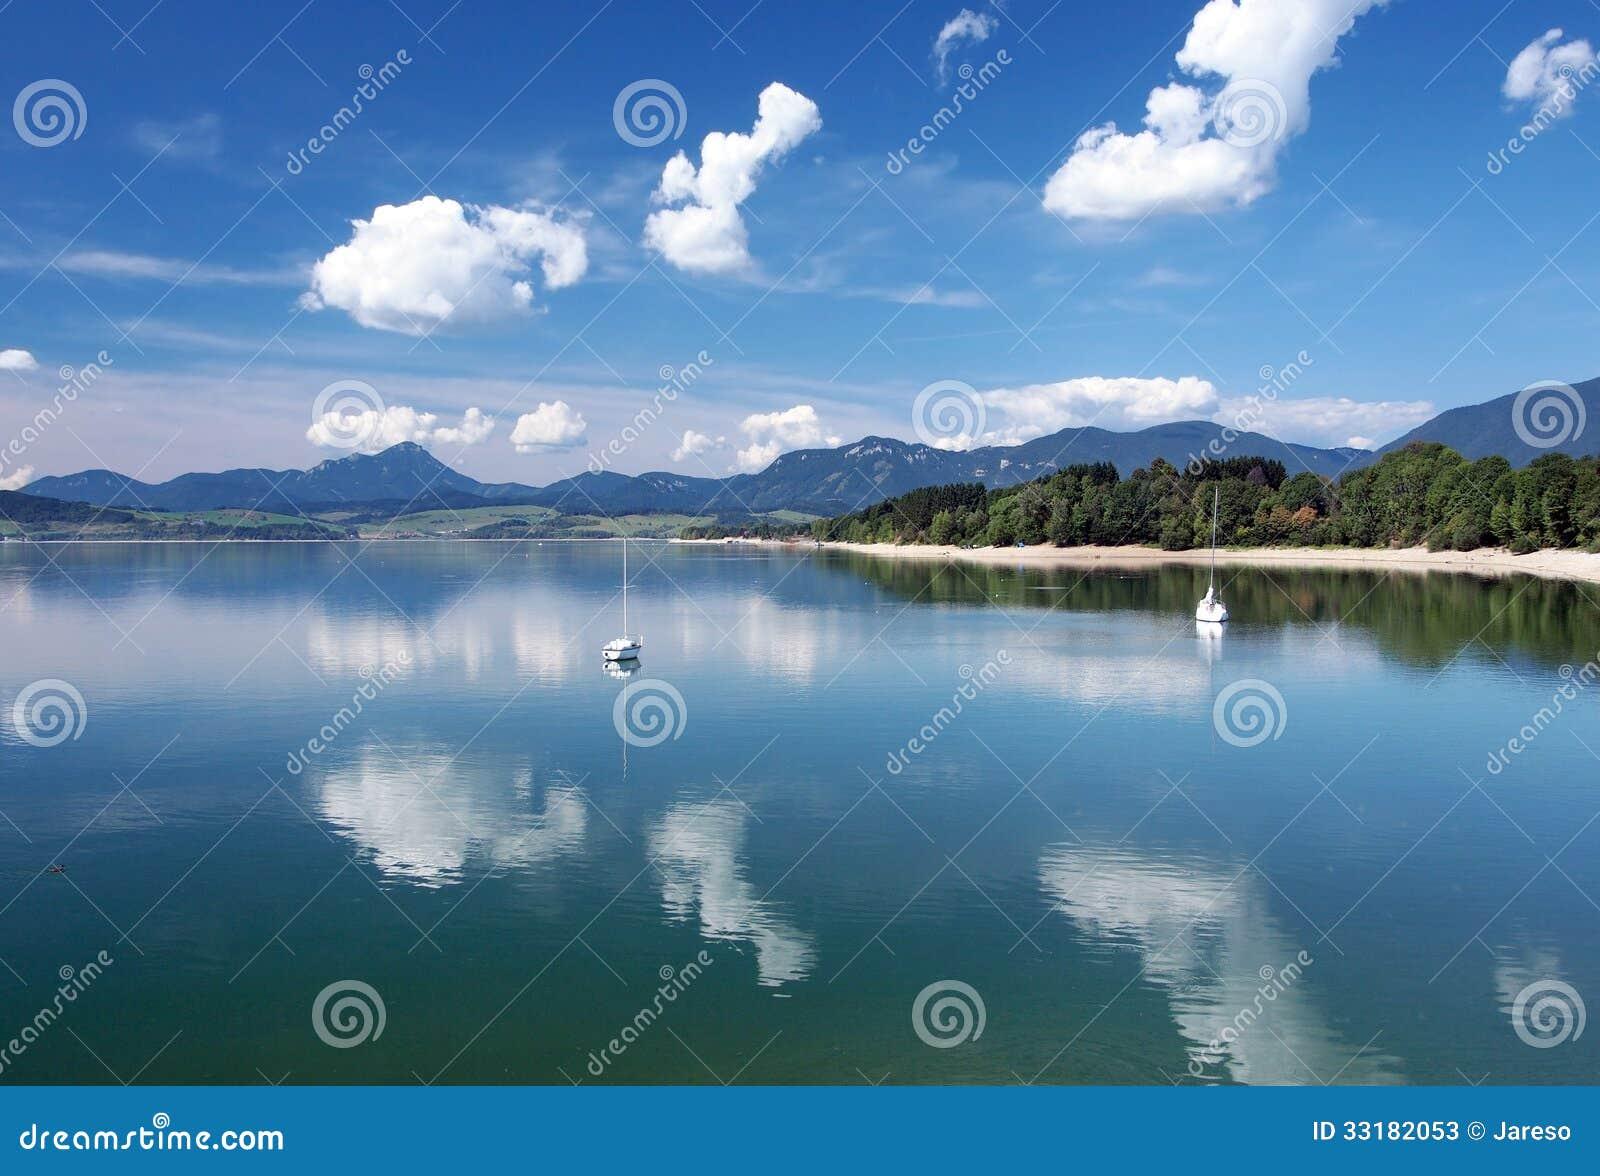 Waters of Liptovska Mara in summer